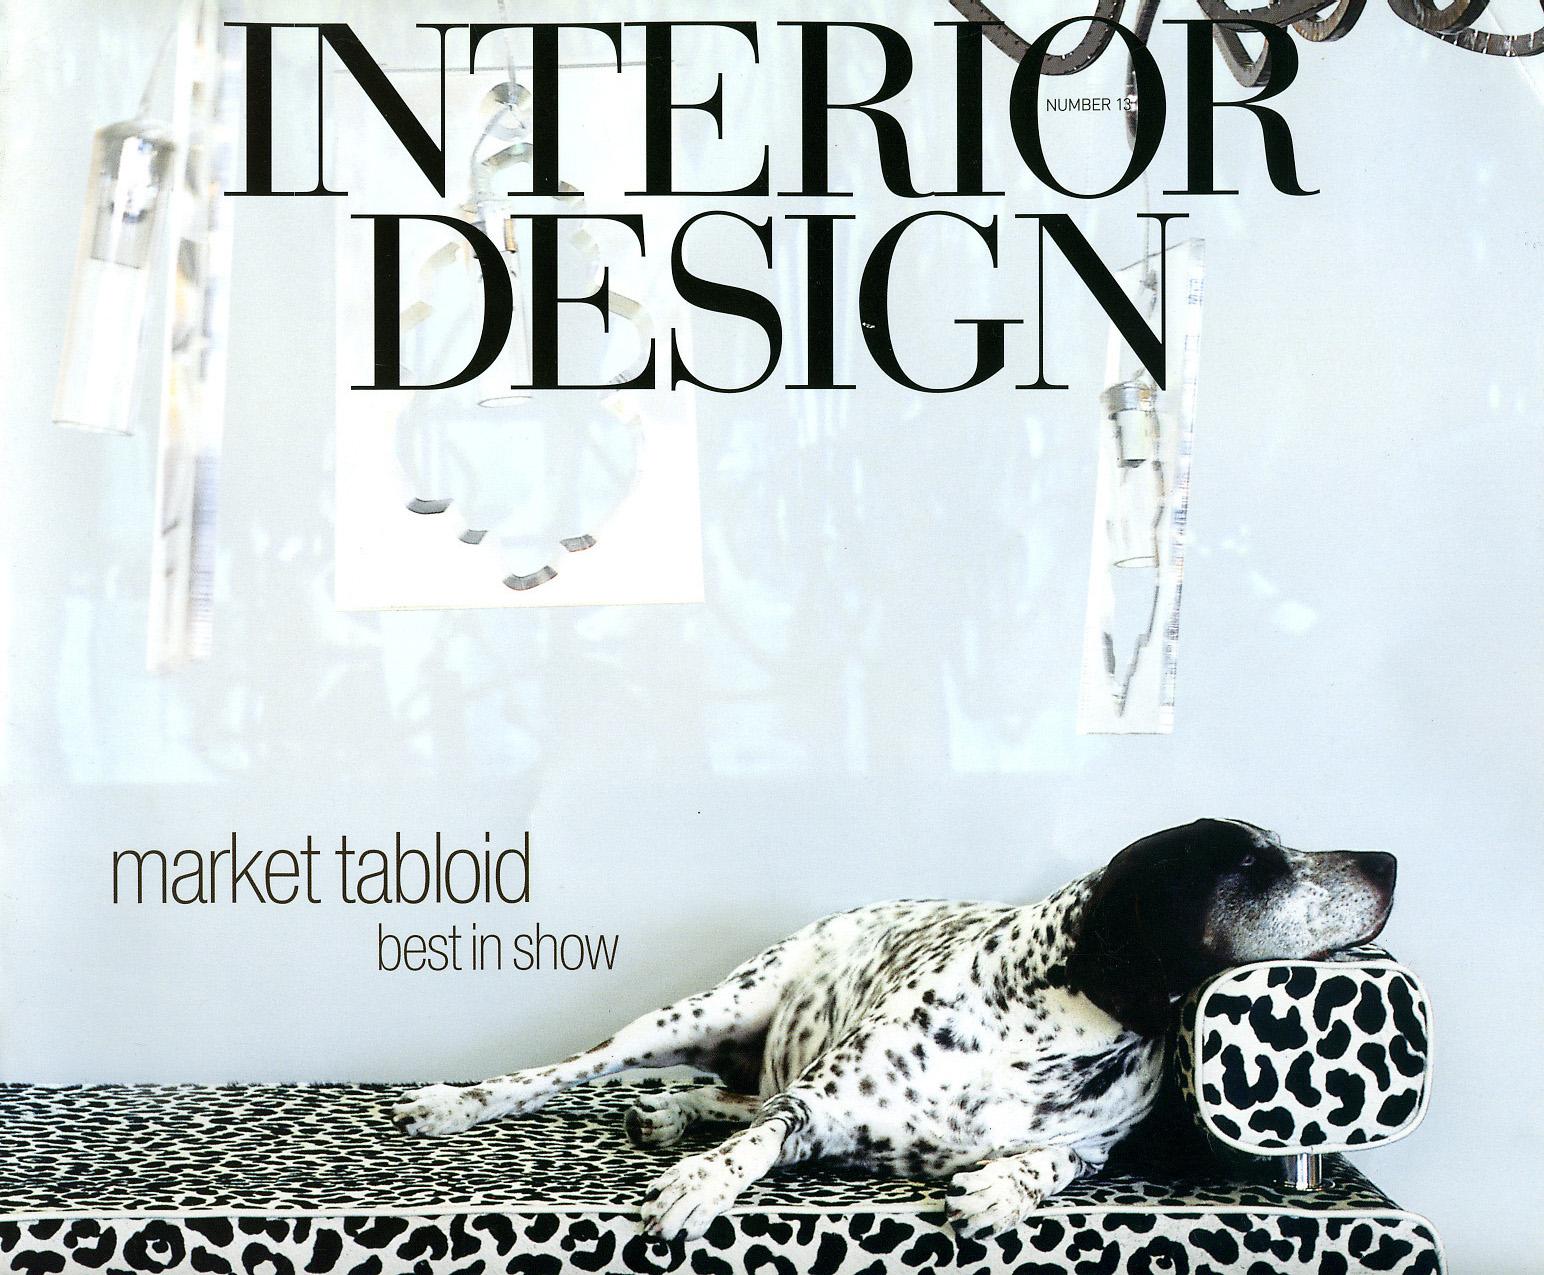 interiordesign.mp3.cover.jpg